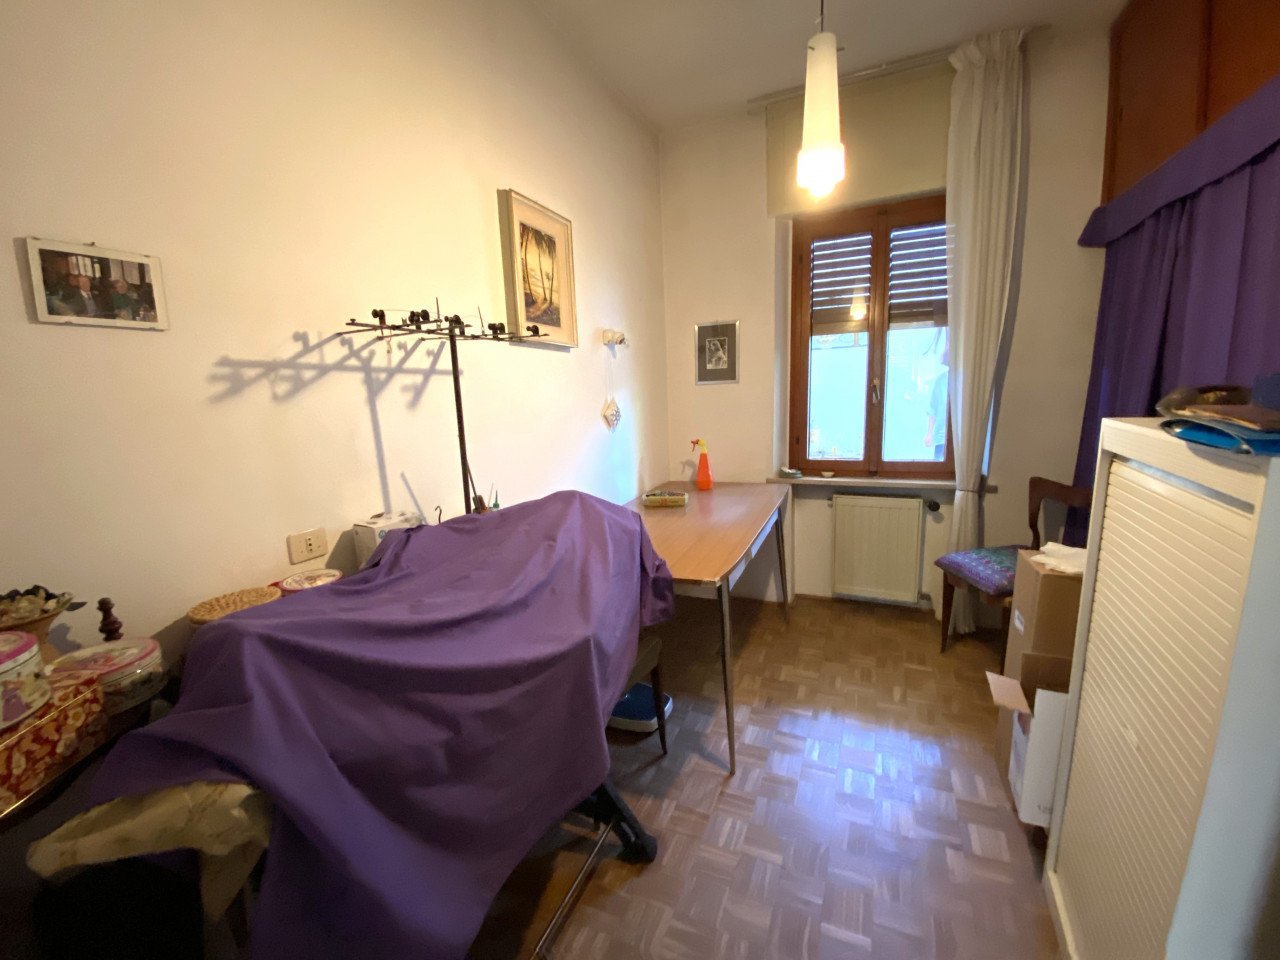 Casa singola con capannone in vendita in centro a Budoia - Rif. V.D.1 https://images.gestionaleimmobiliare.it/foto/annunci/200702/2265893/1280x1280/009__img_2983.jpg